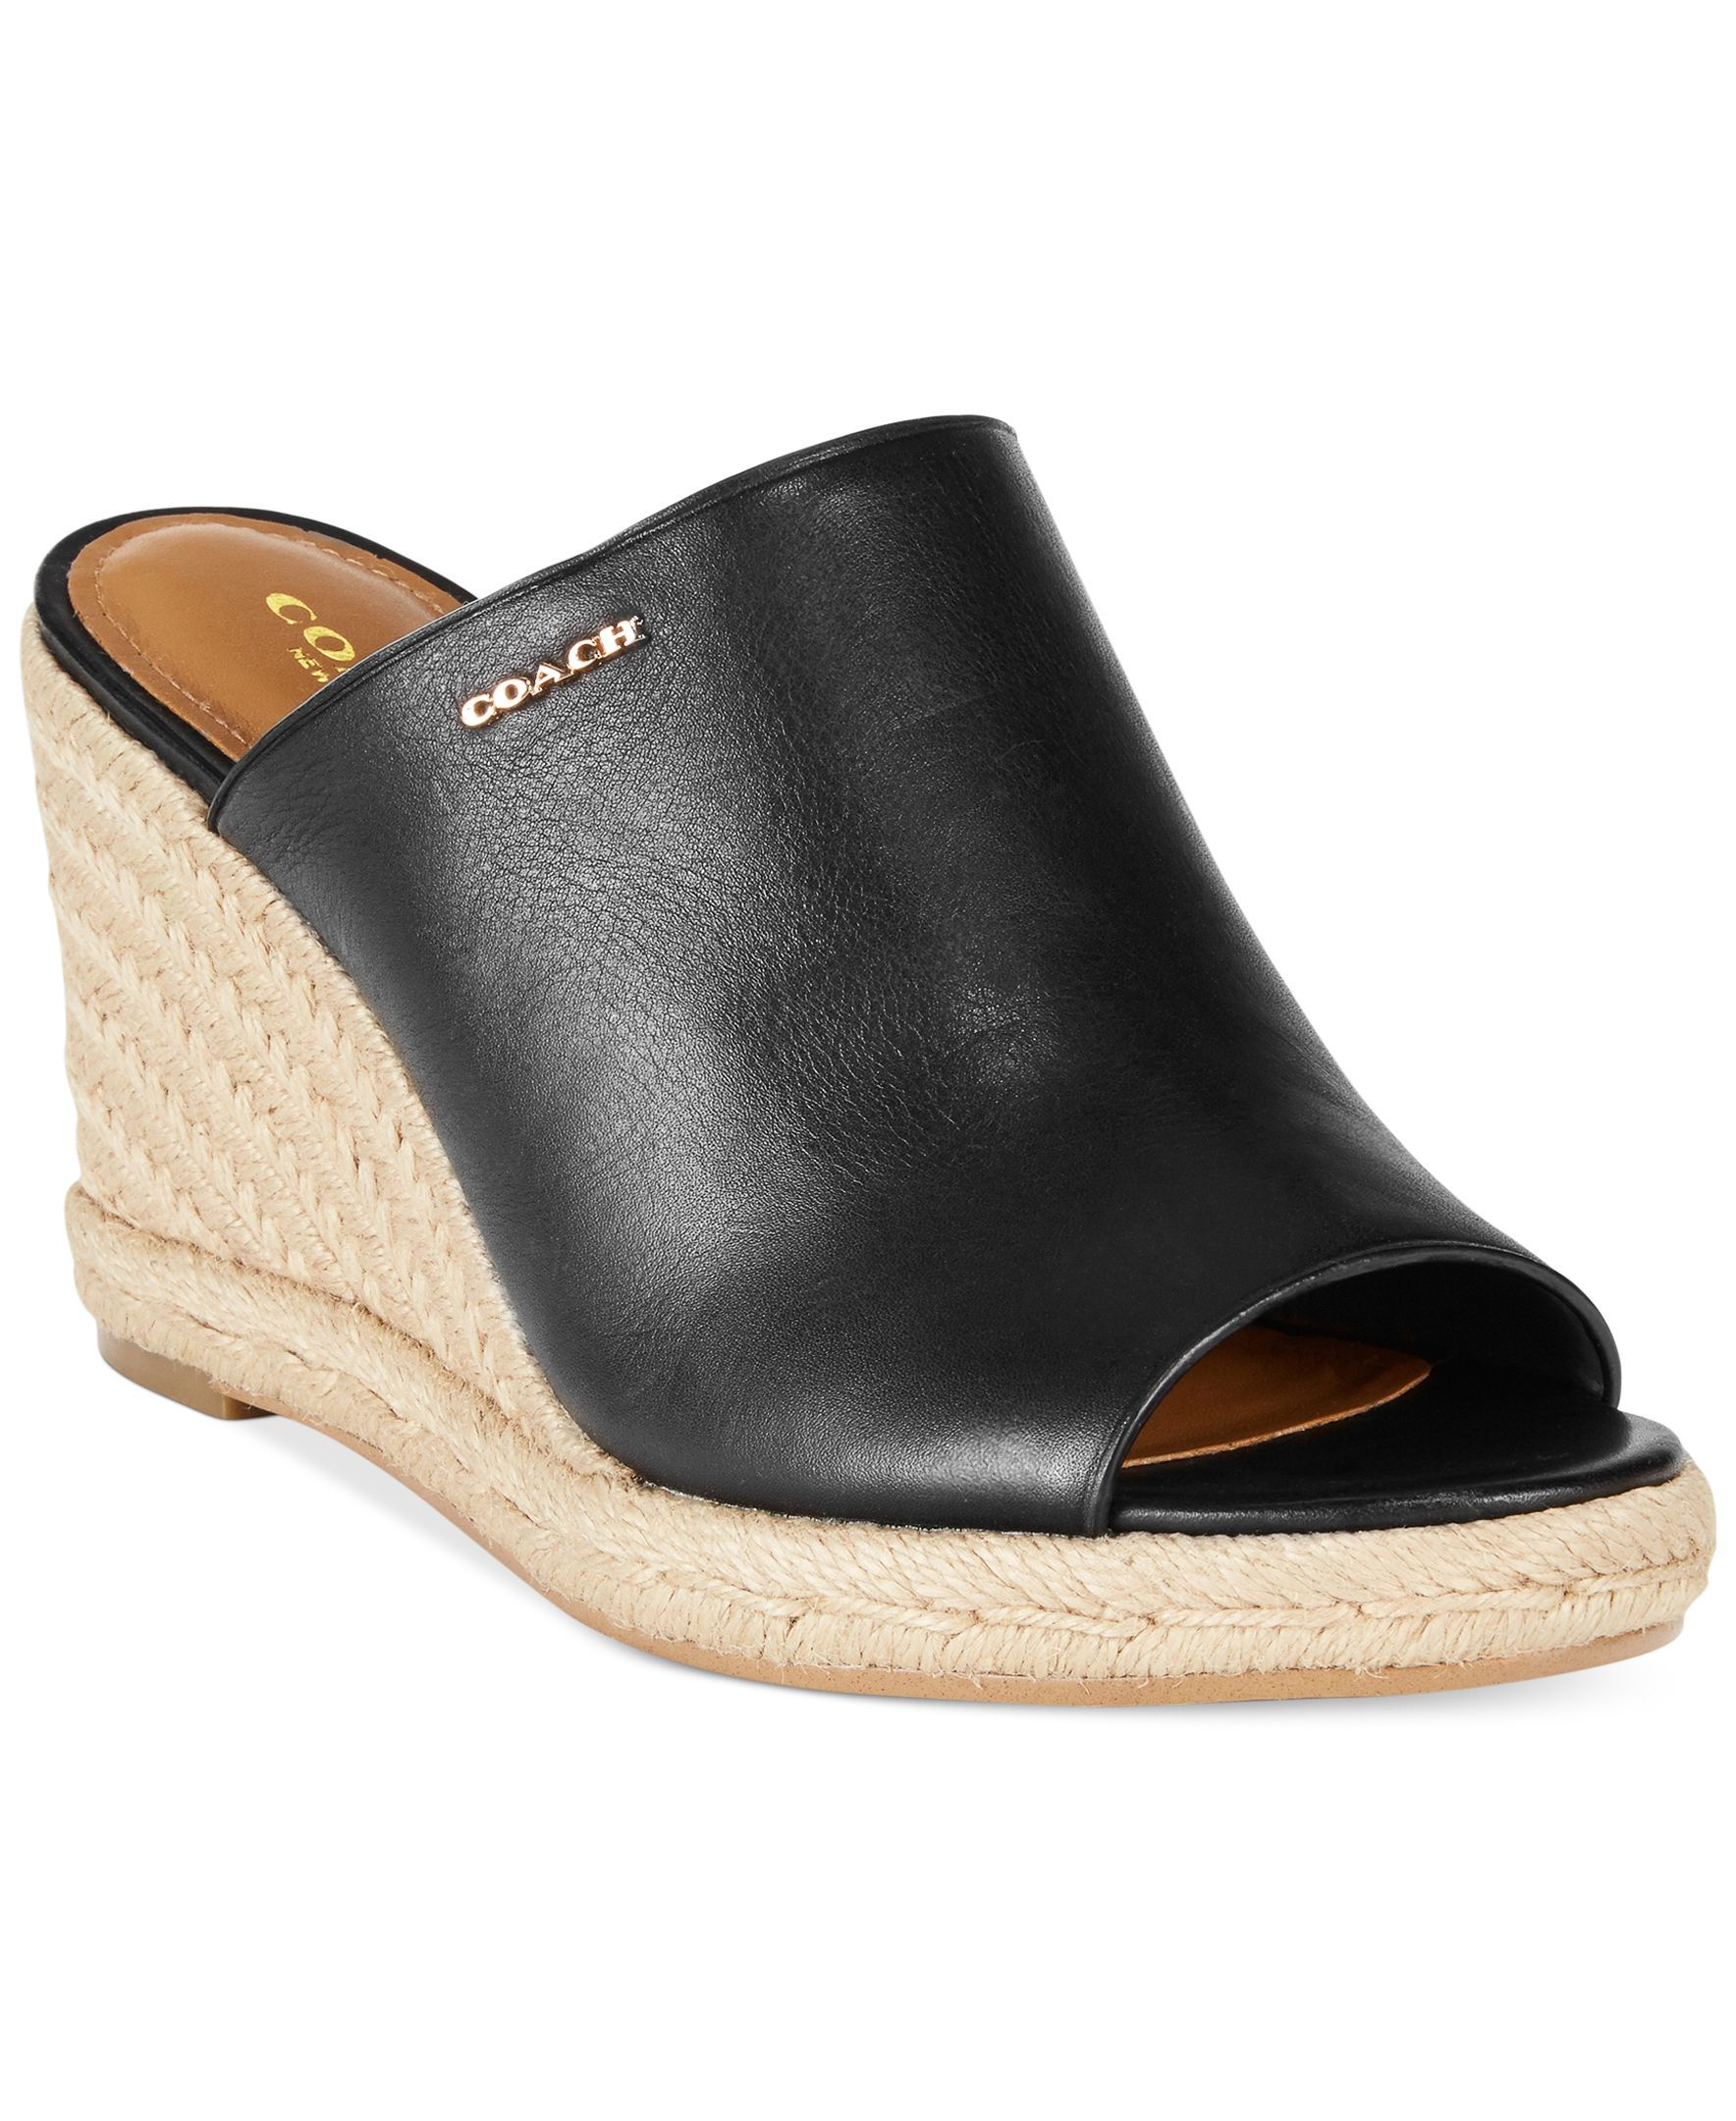 c288538196b Coach Gayle Espadrille Wedge Sandals   I❤️ espadrilles ...